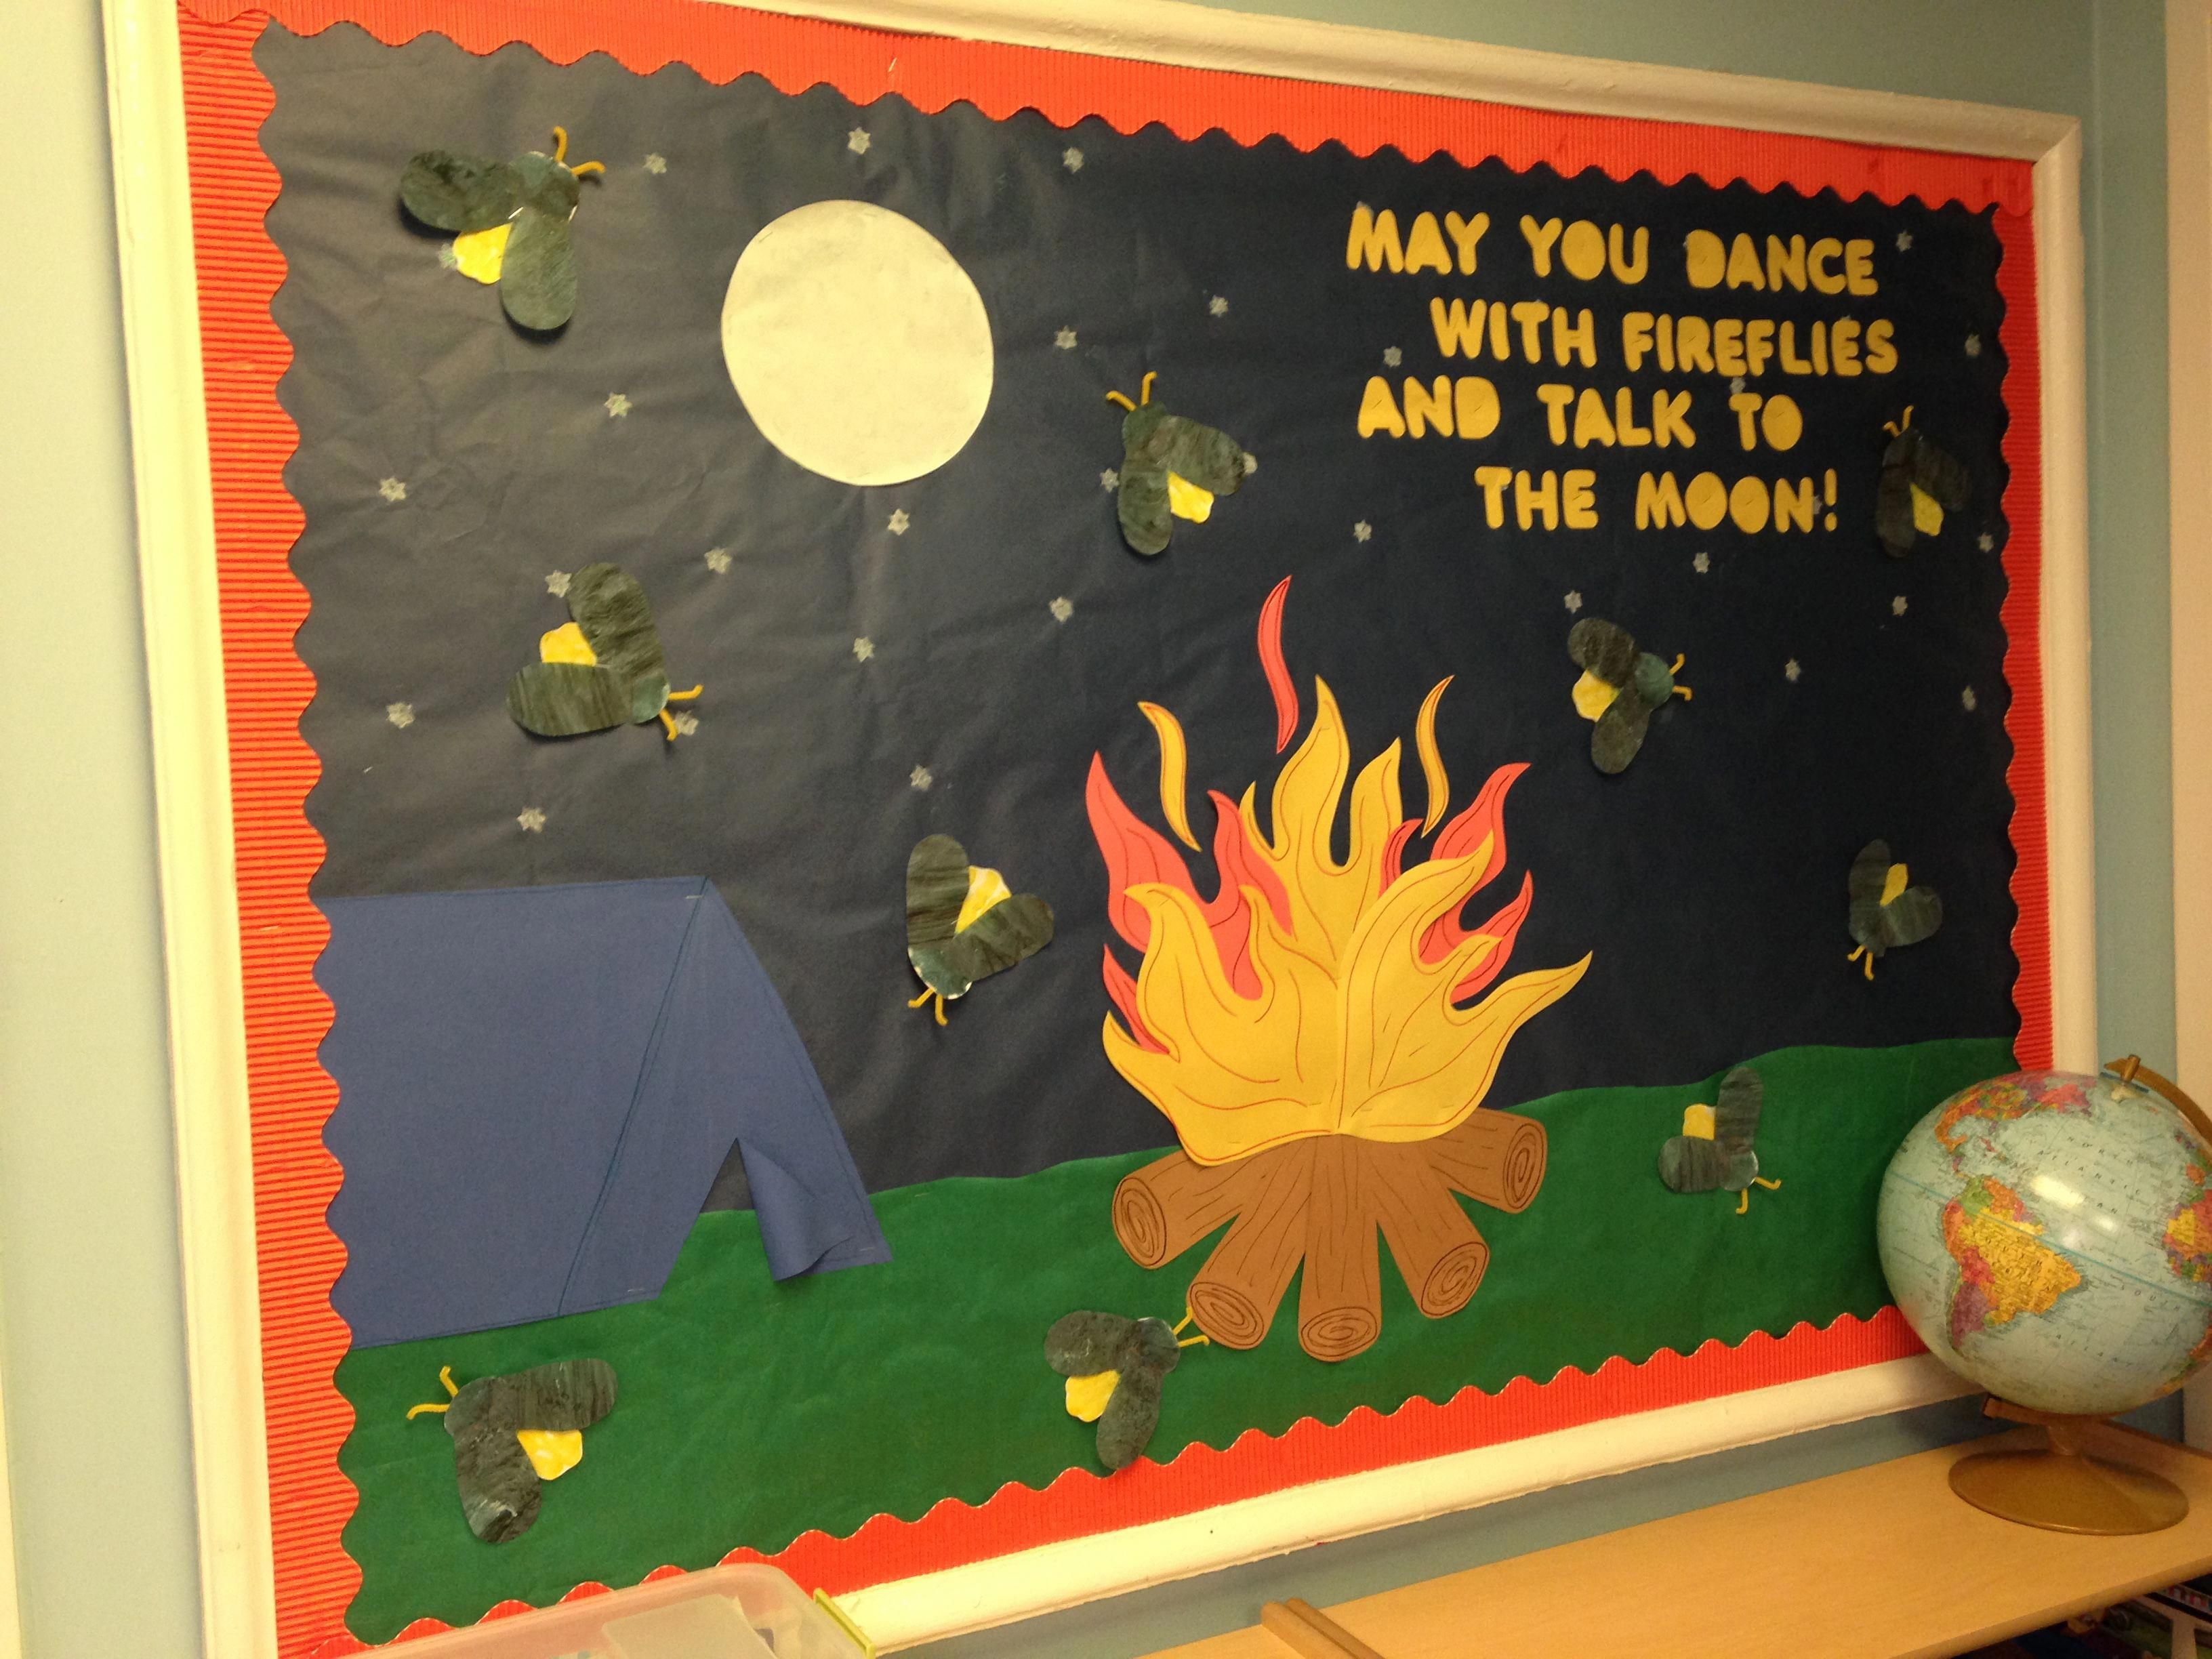 Camping Preschool Bulletin Board With Handprint Fireflies